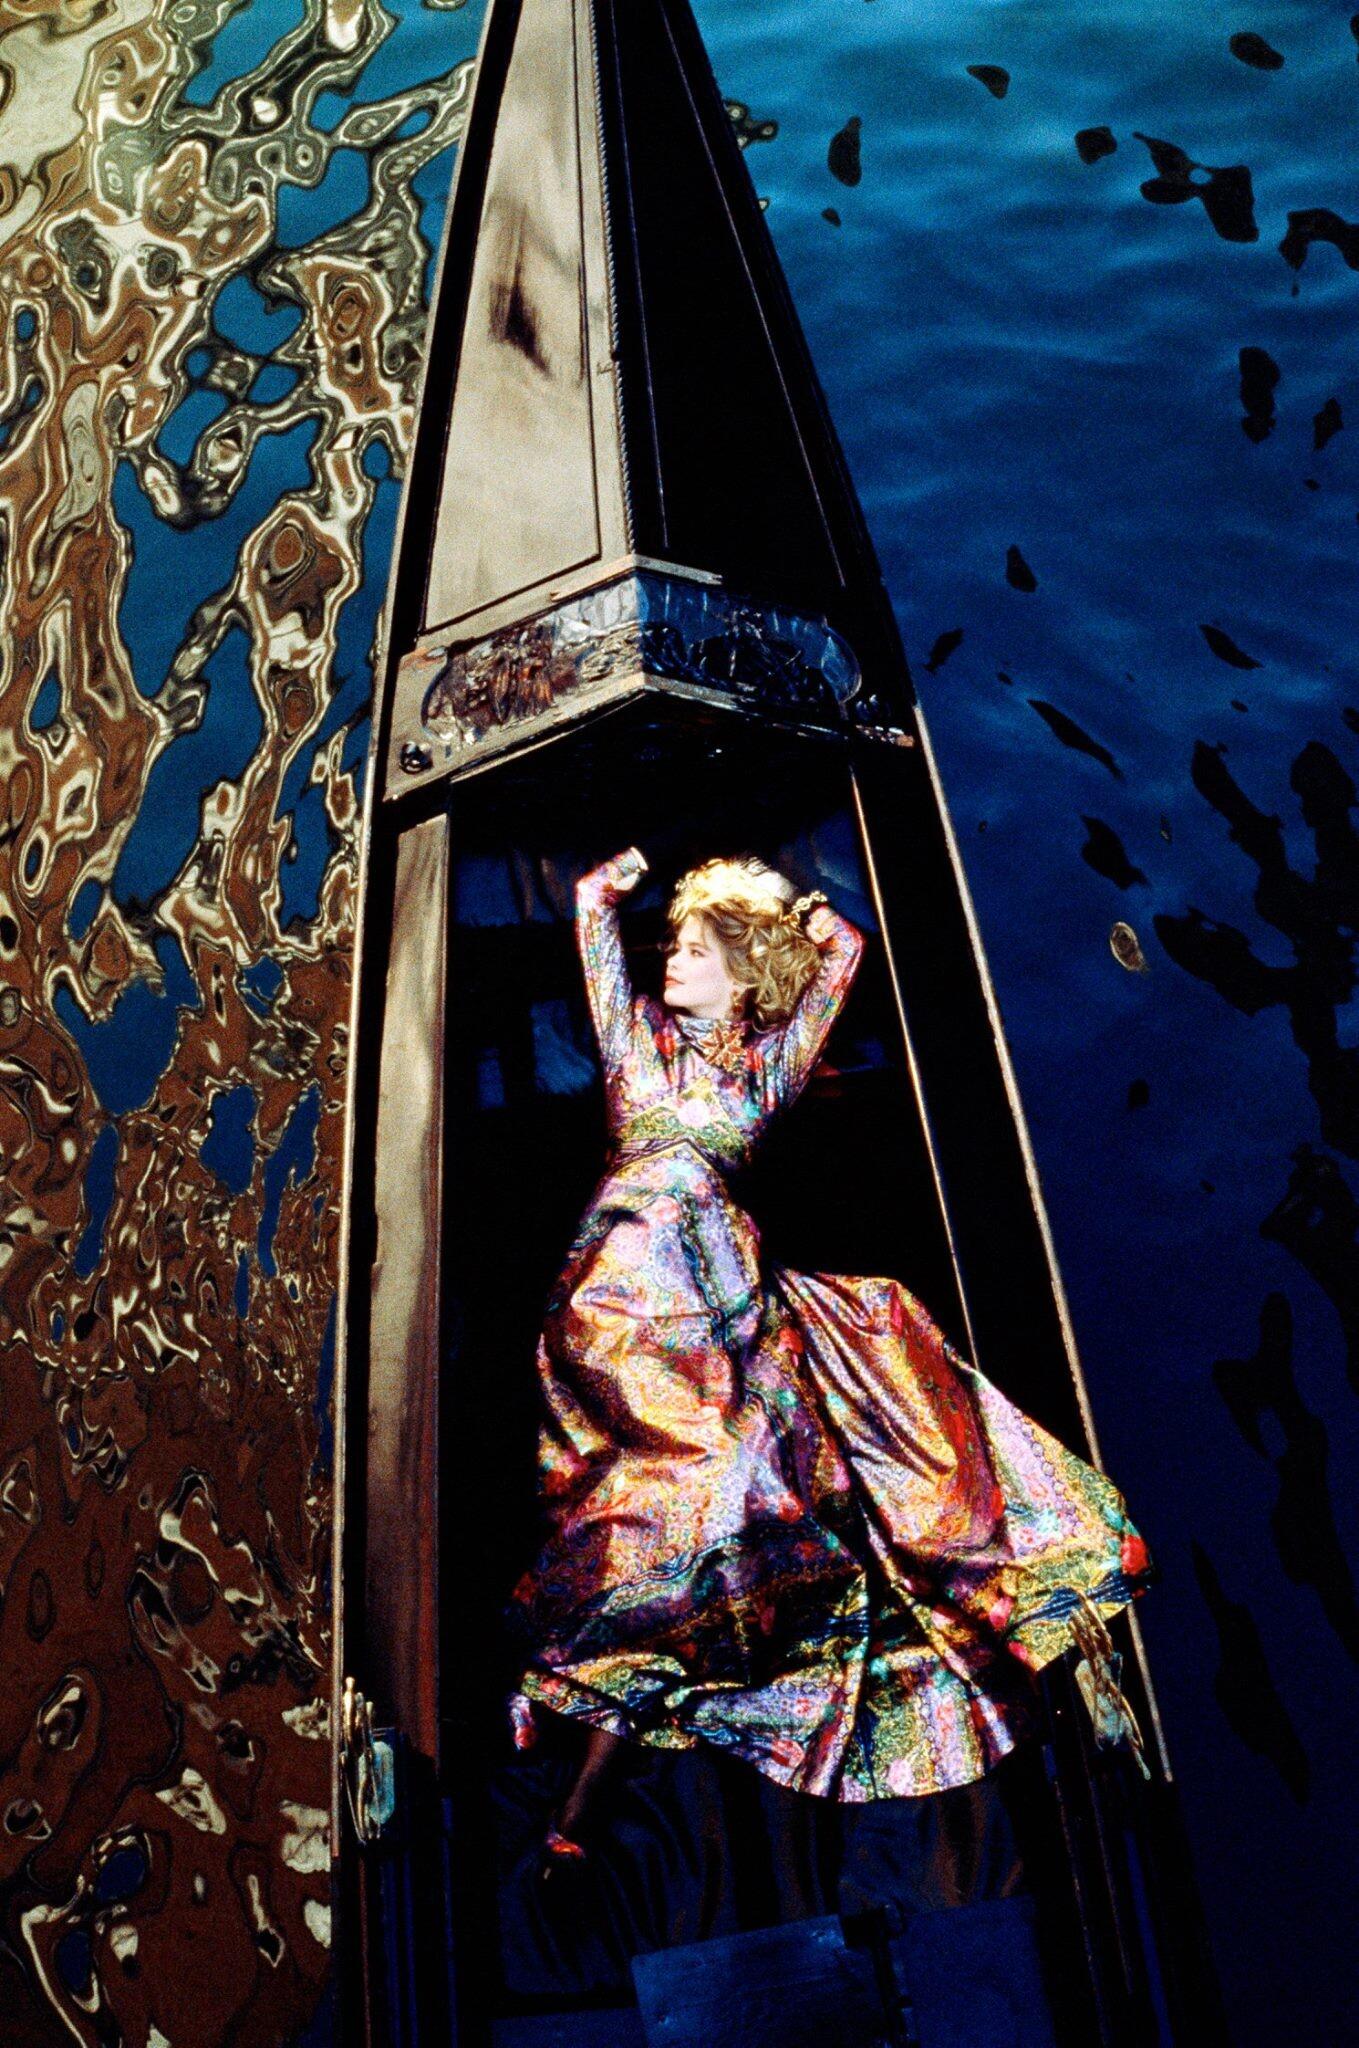 Клаудия Шиффер, Венеция, 1995. Фотограф Жан-Даниэль Лорье